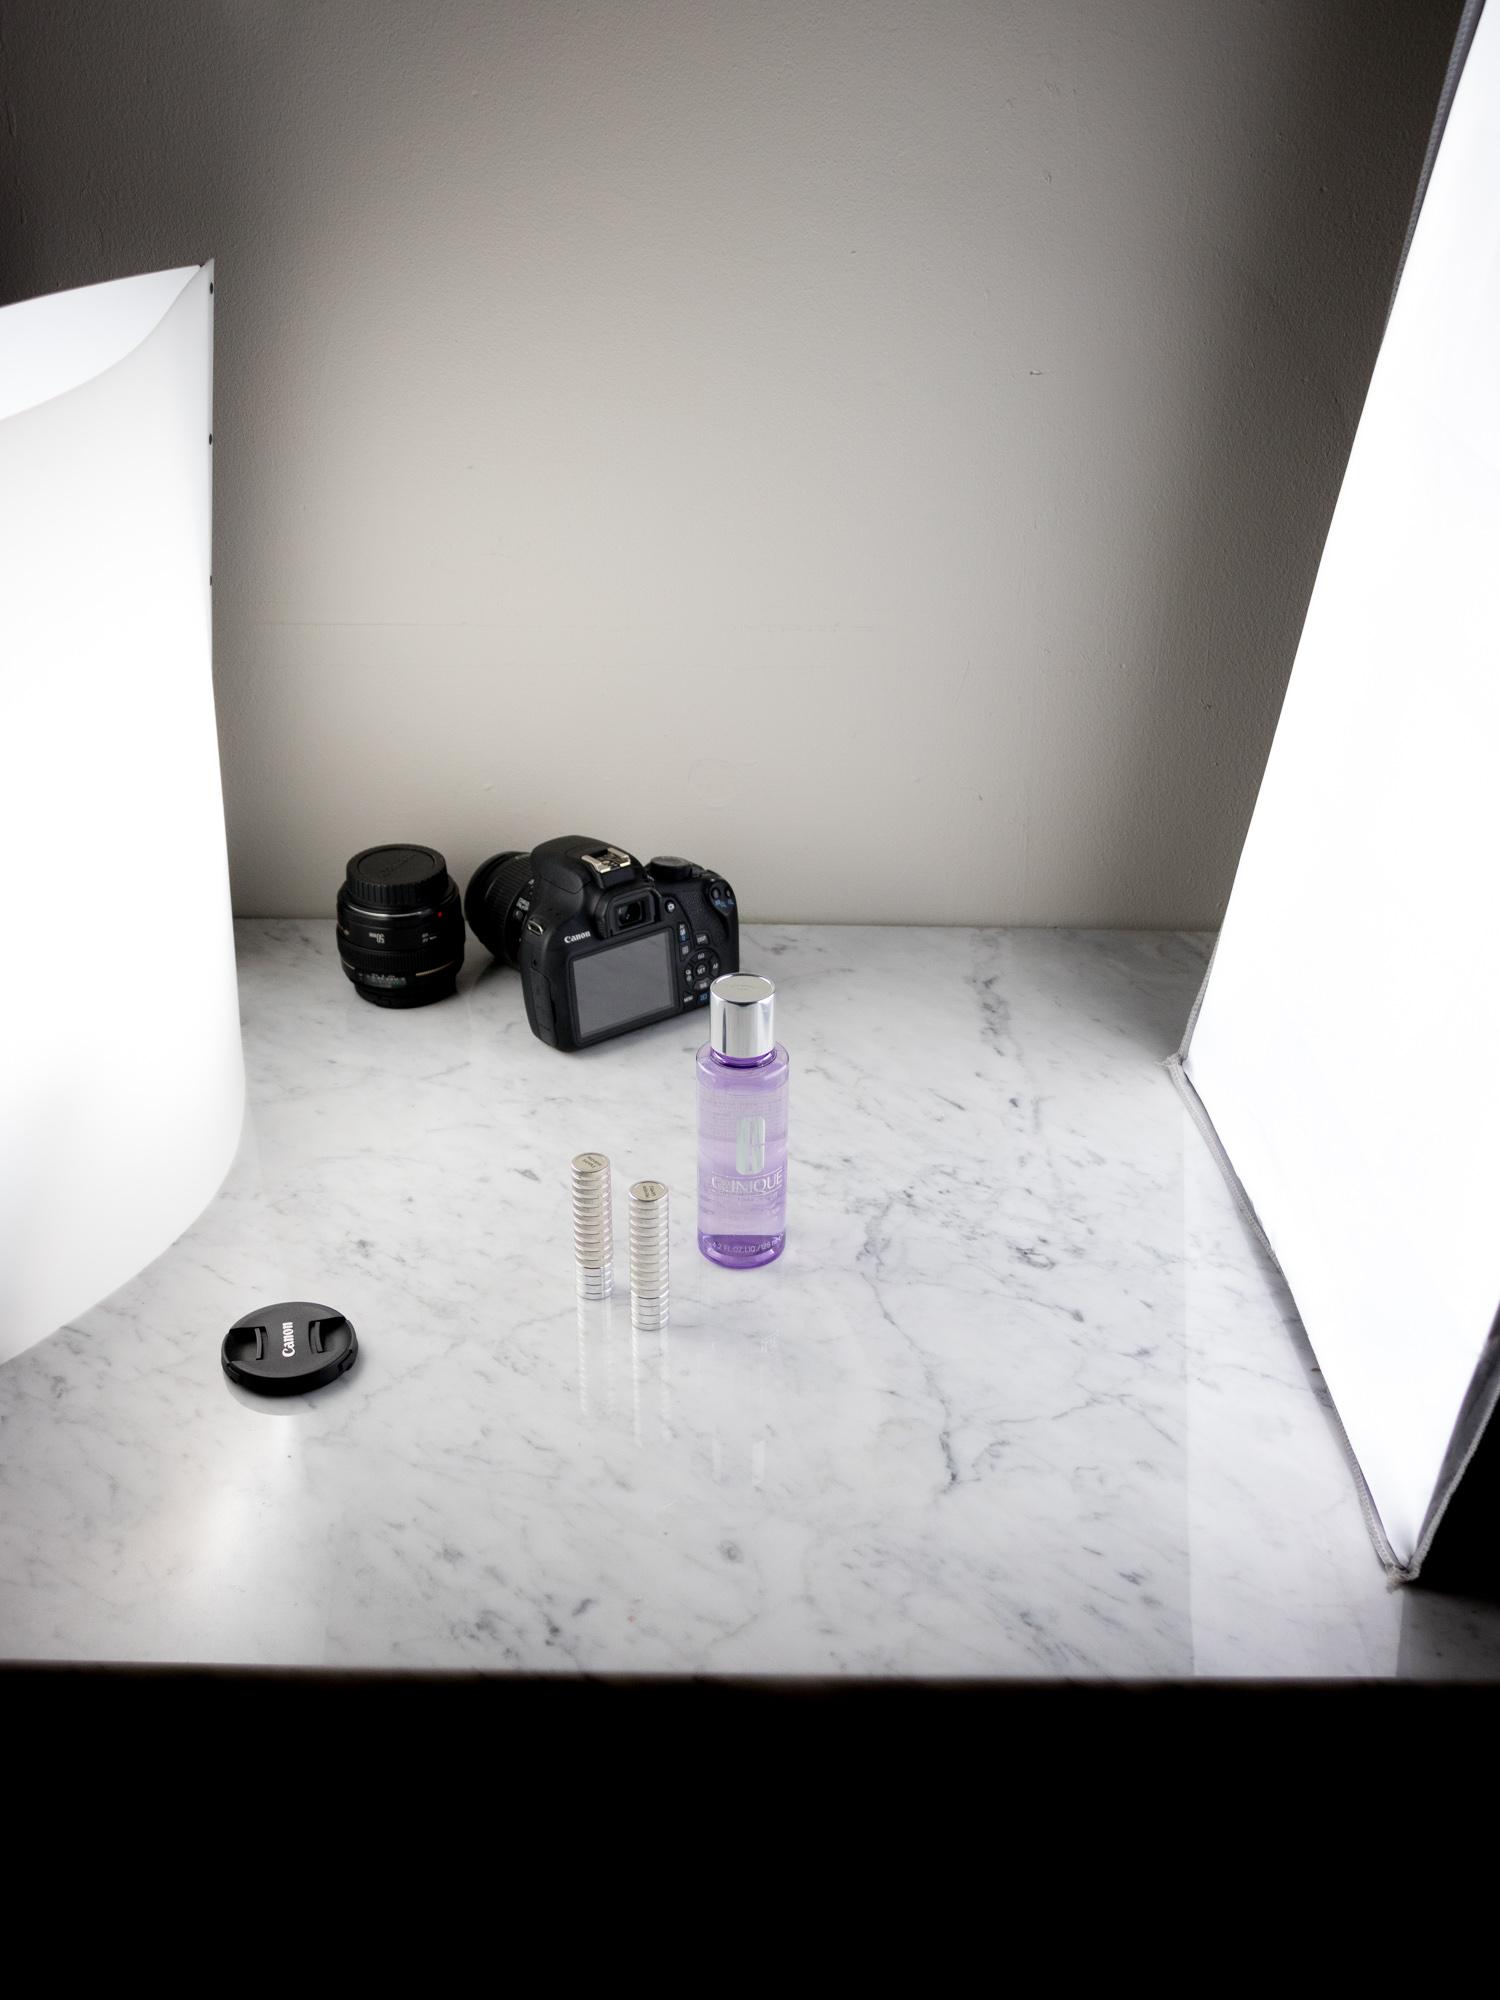 Taking Photos as a Beauty Blogger